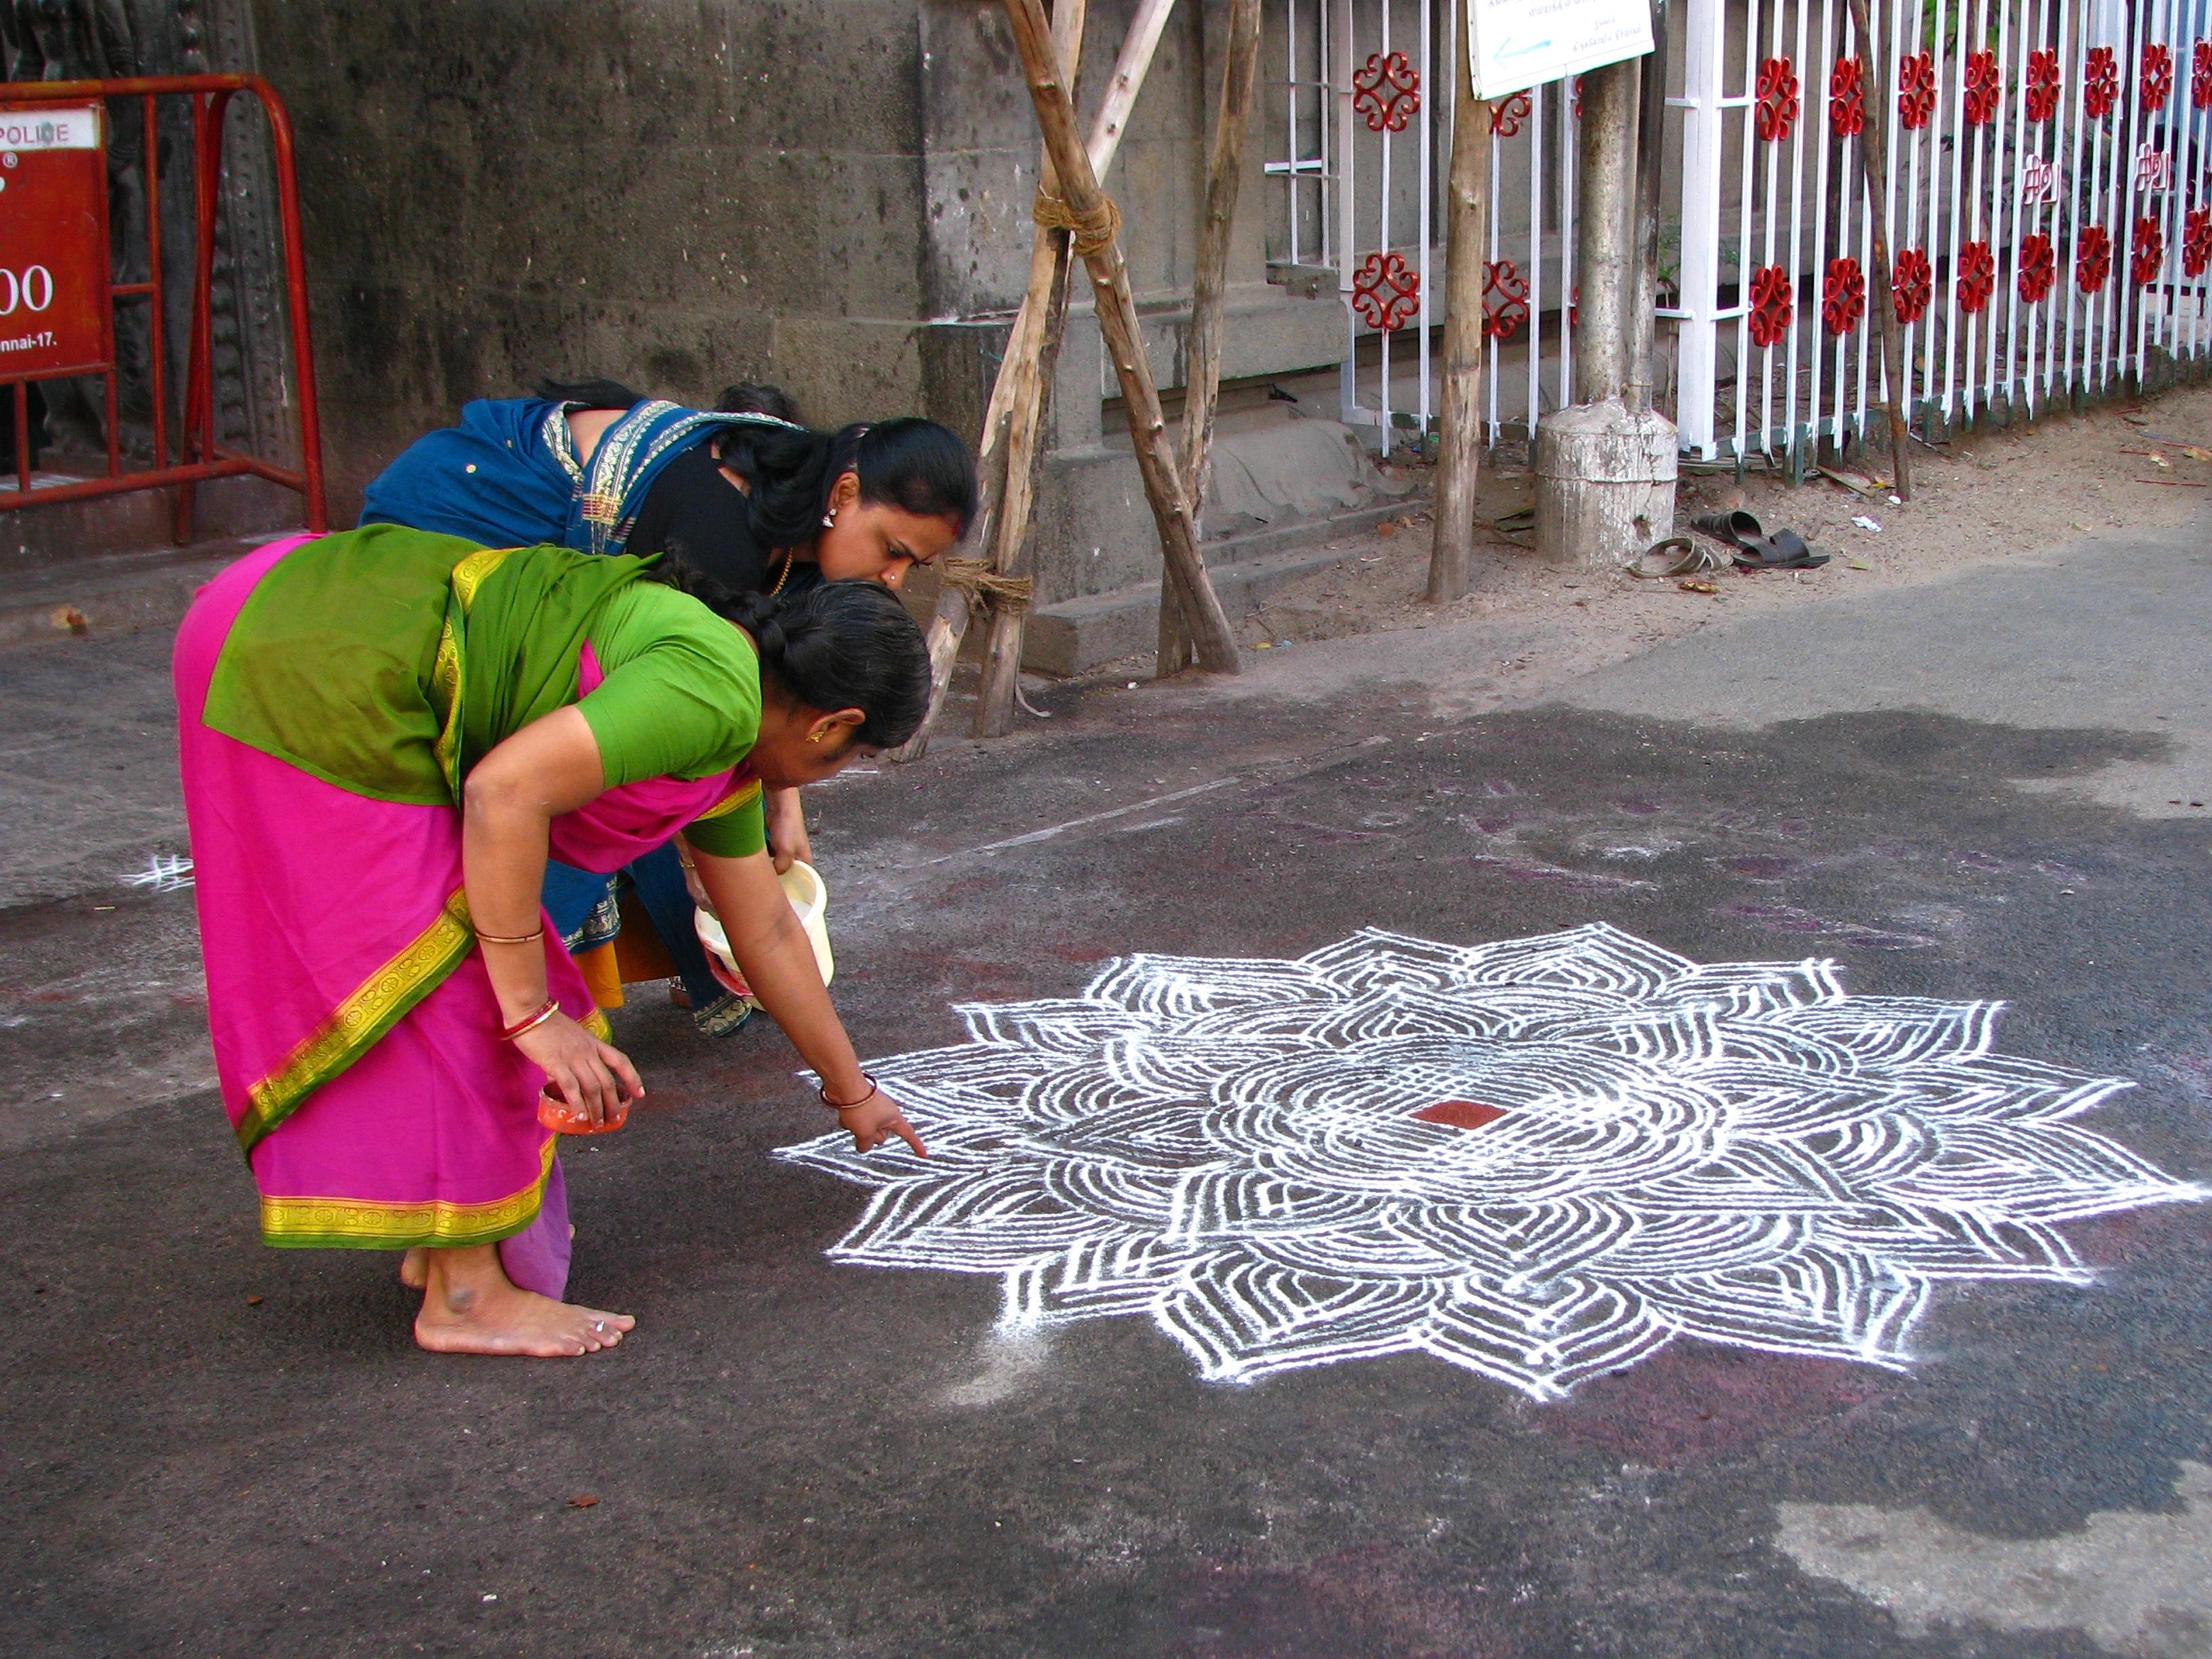 File:India - Sights & Culture - Women drawing an intricate kolam ...